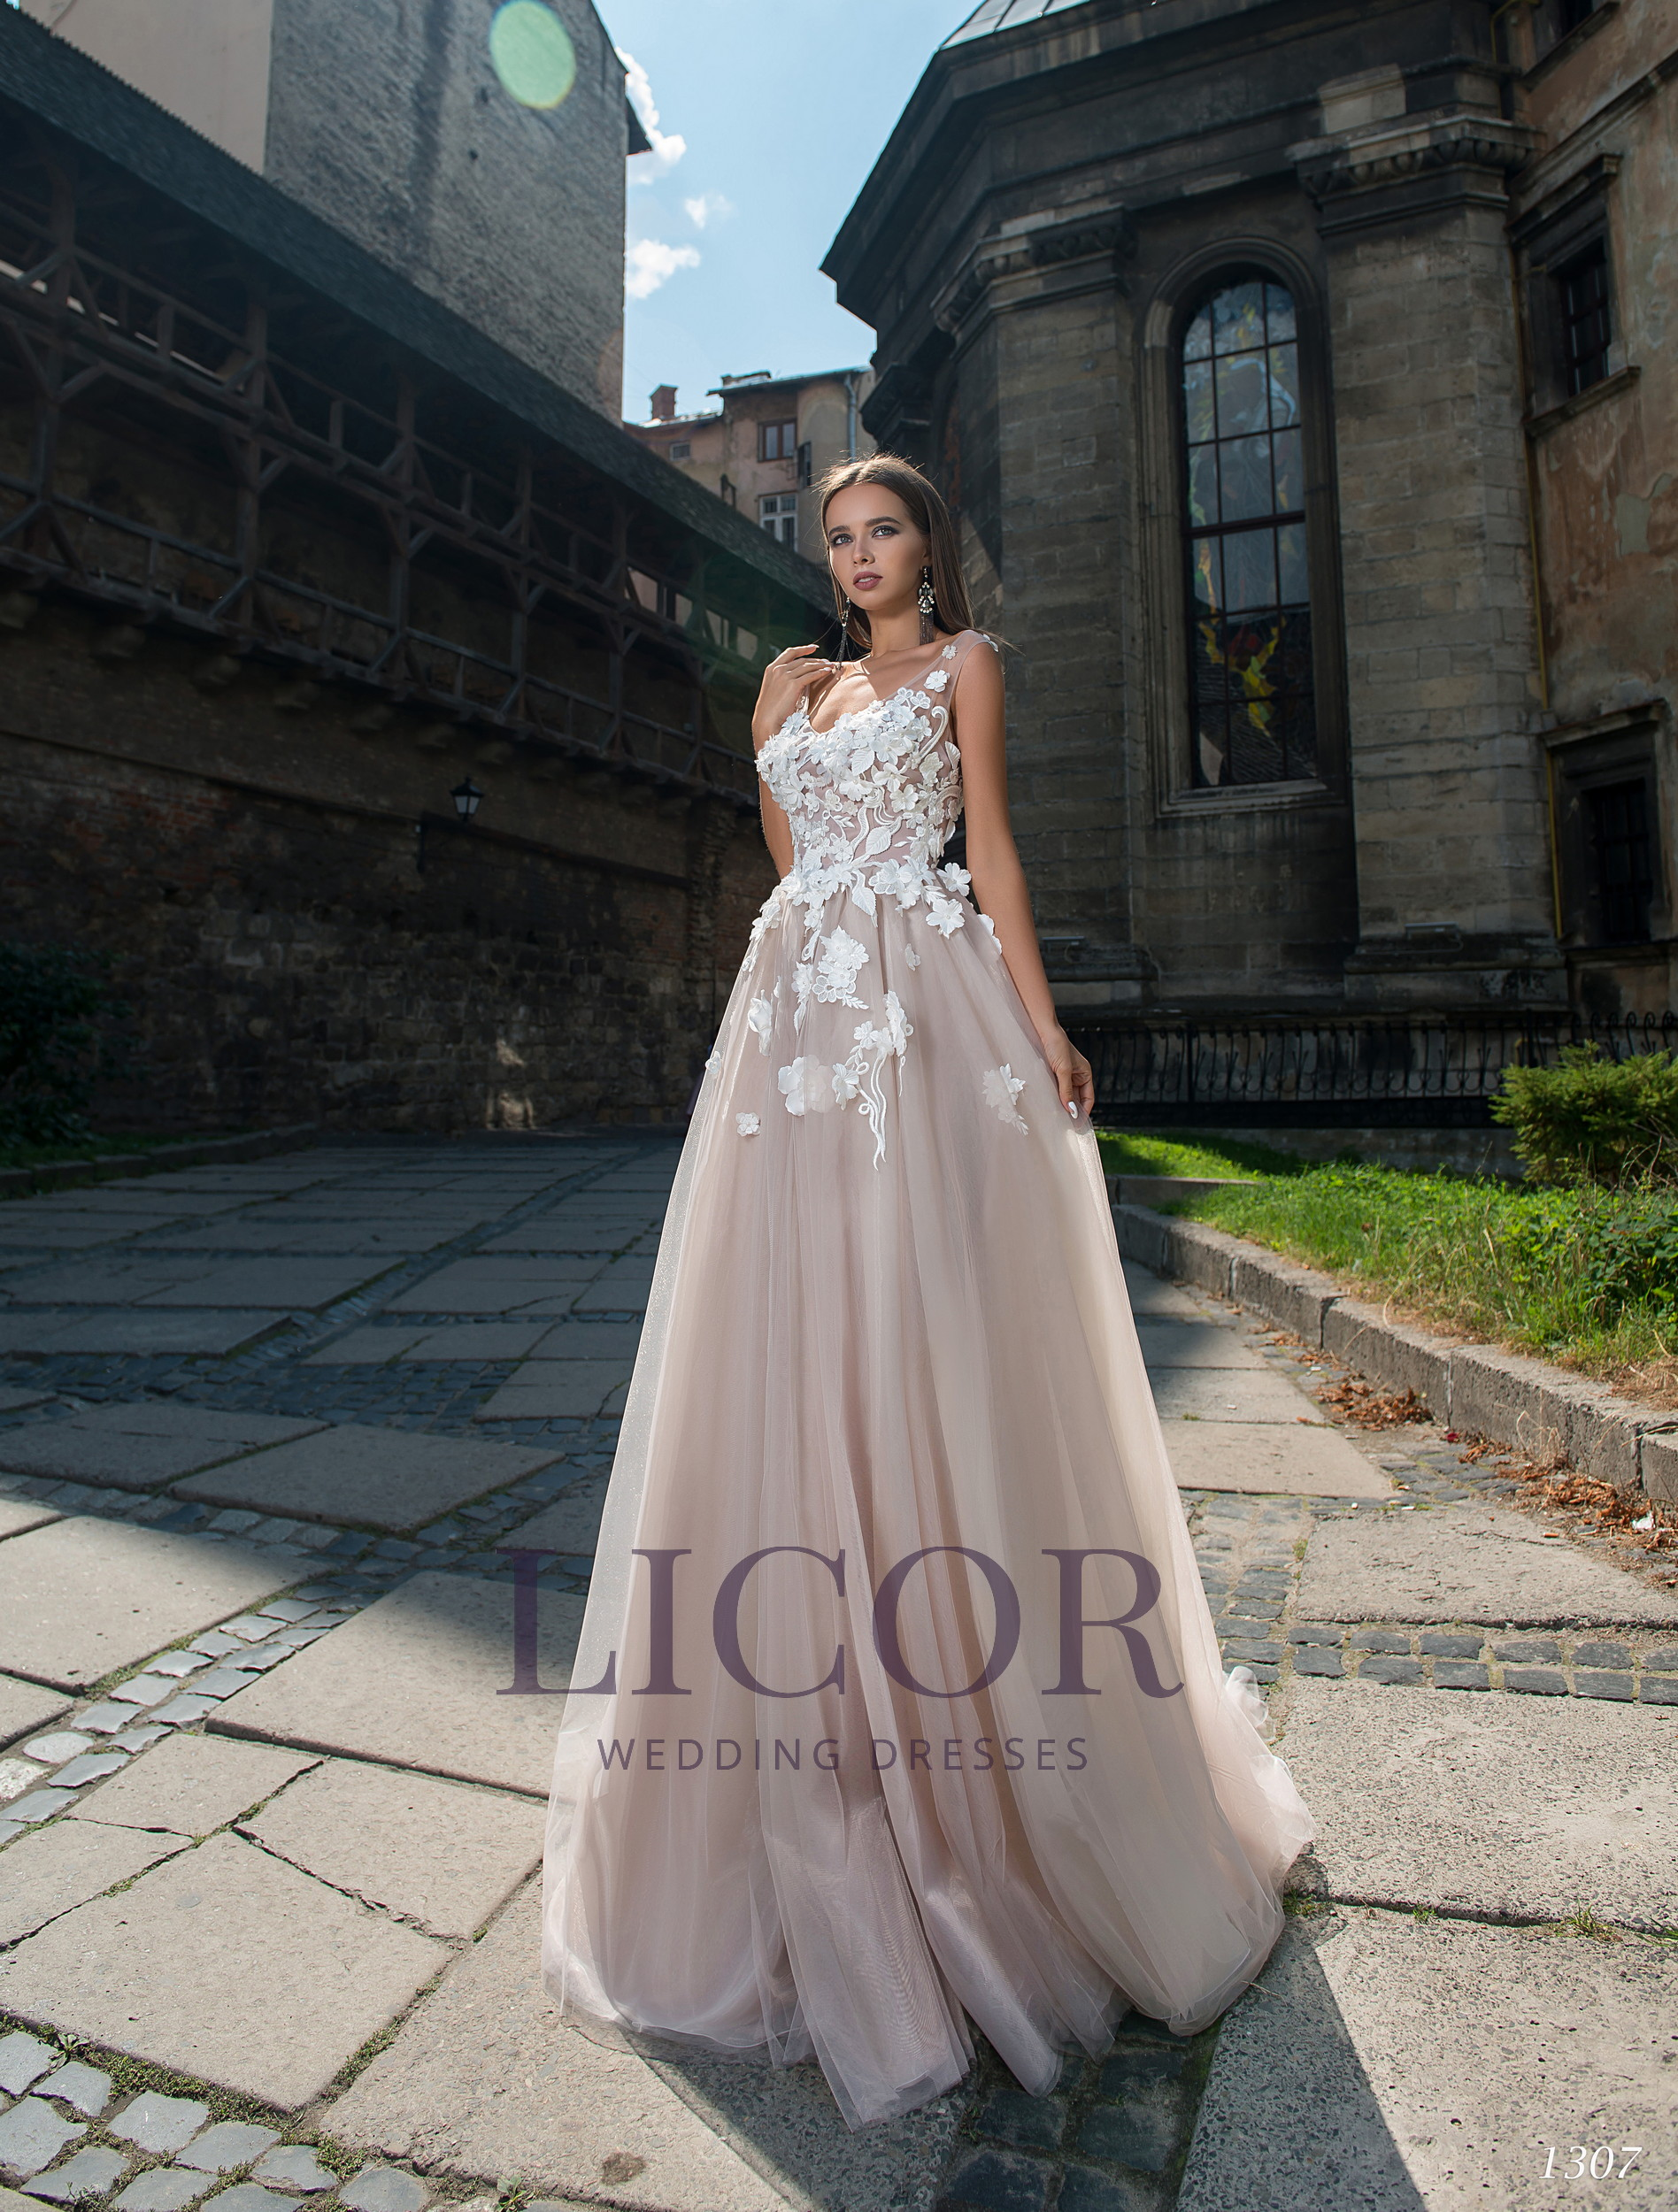 https://licor.com.ua/images/stories/virtuemart/product/1307(1).jpg